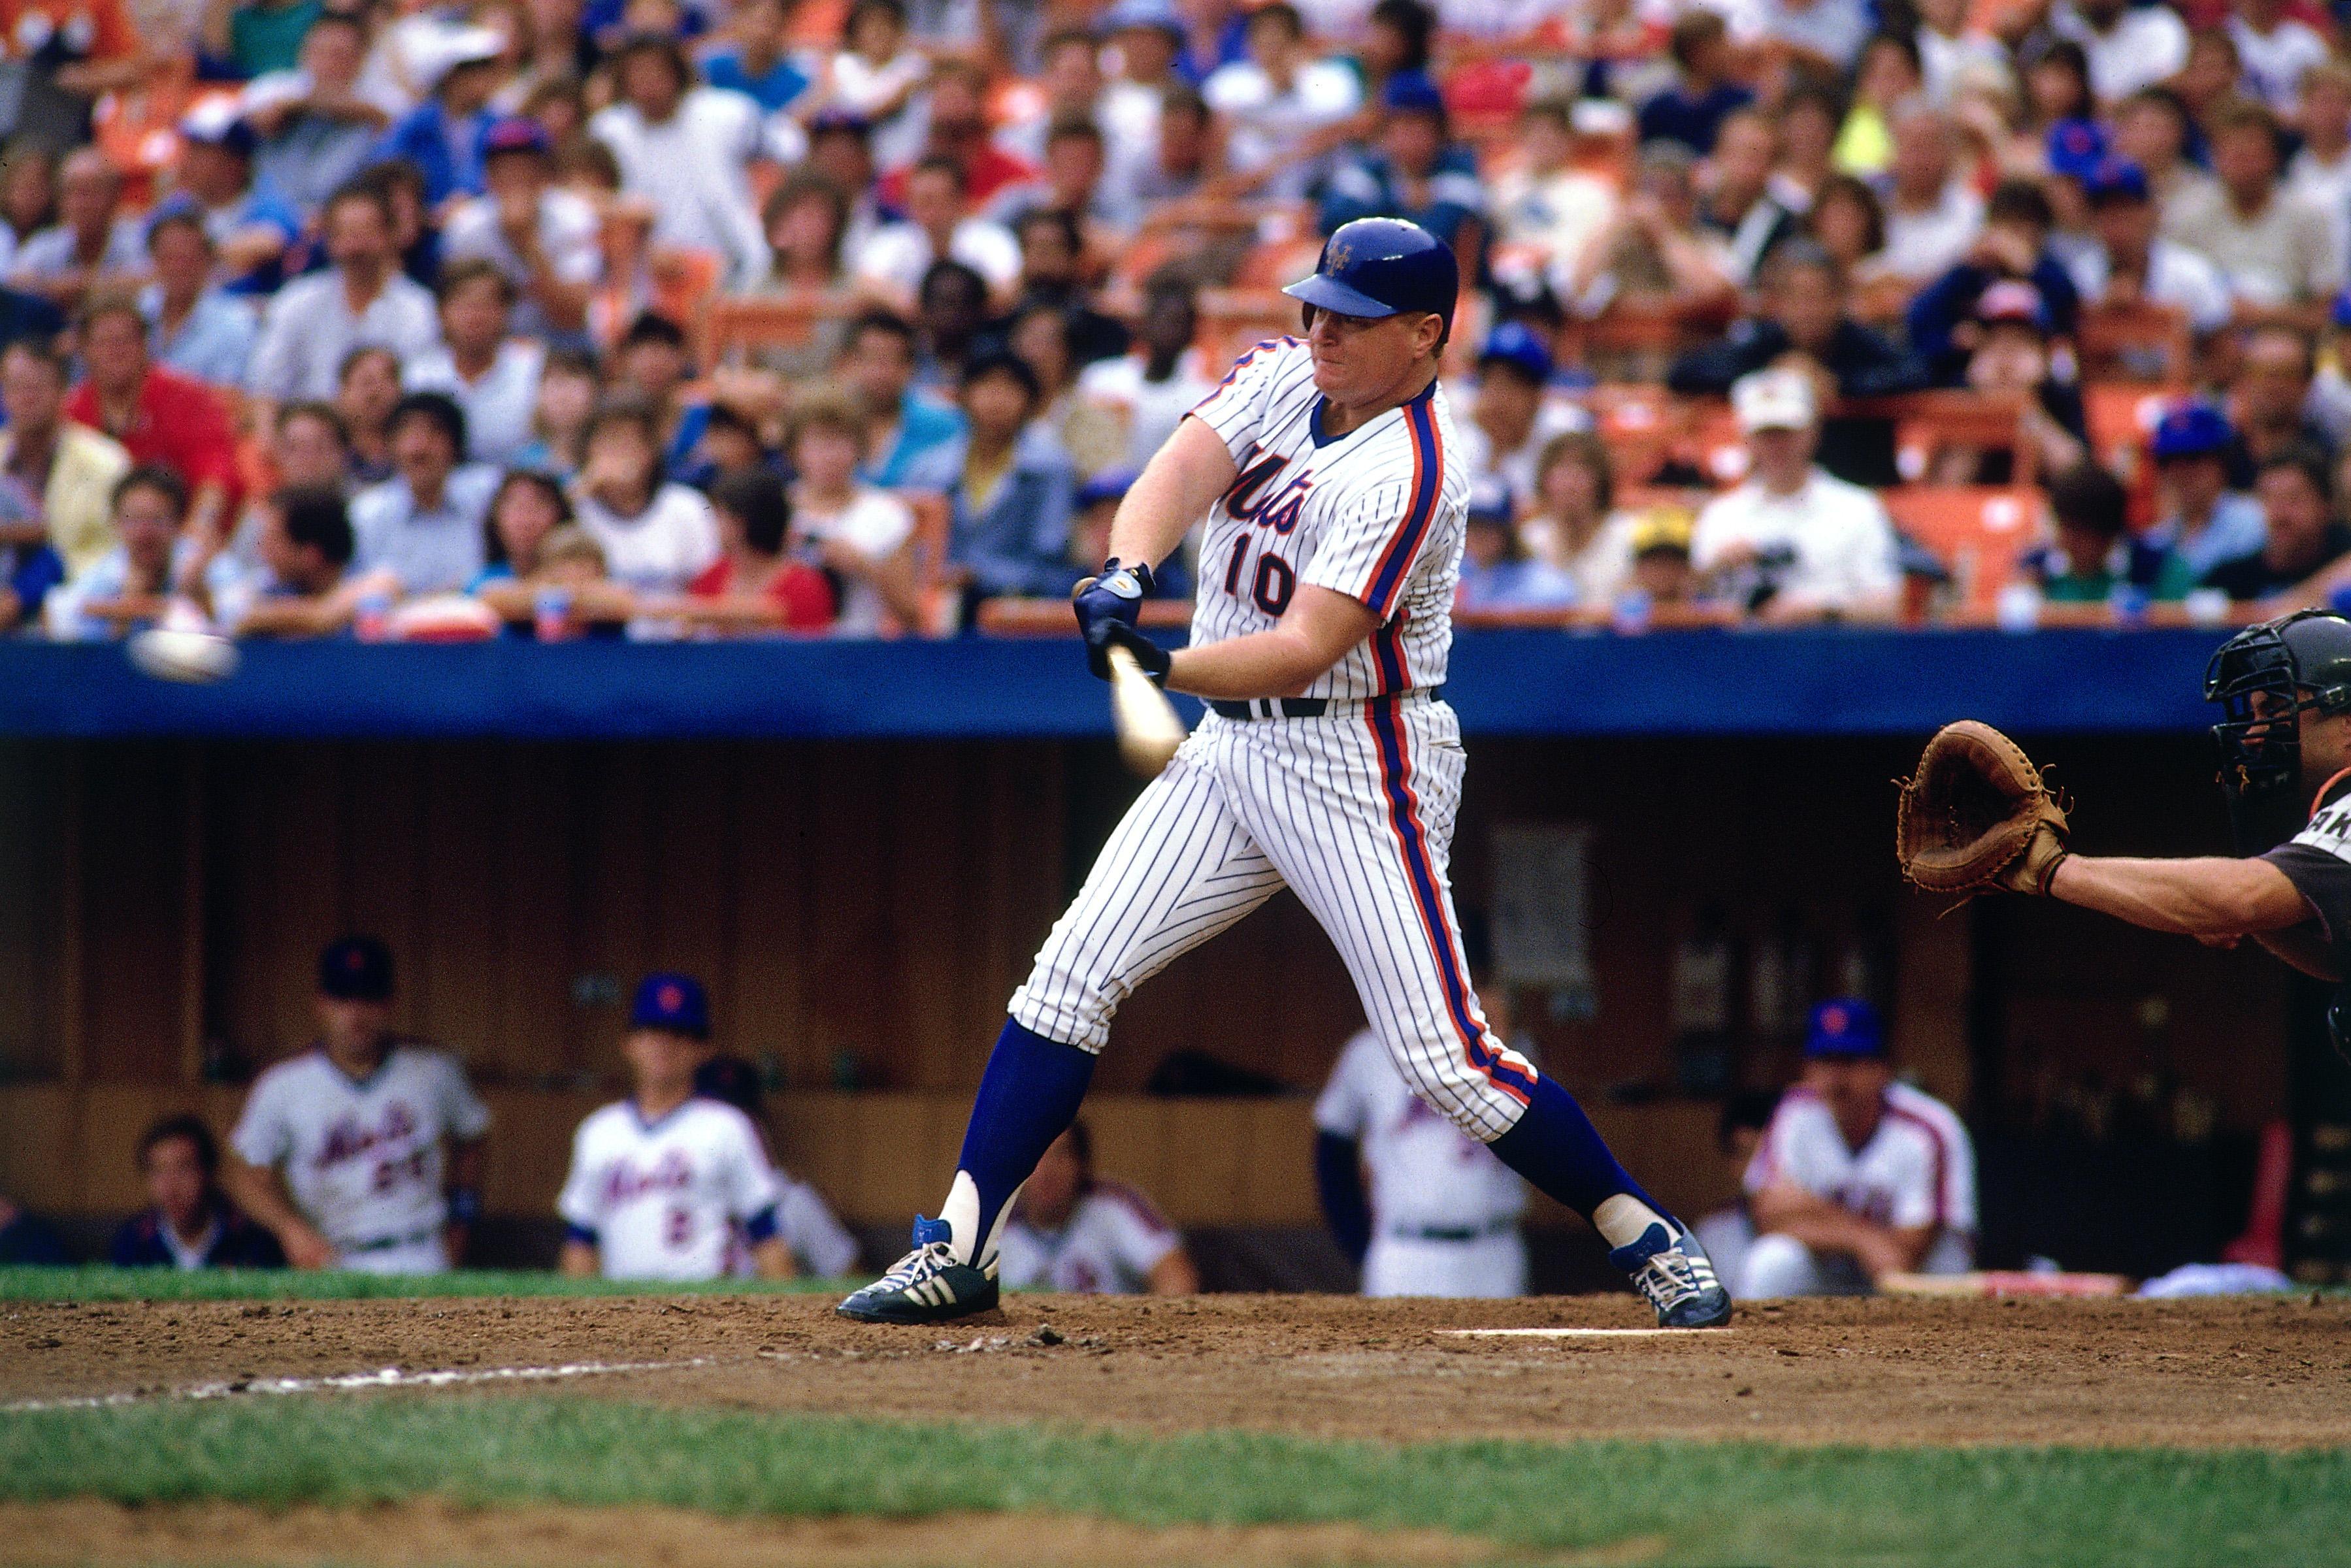 'Rusty 'Staub is a six-time MLB All Star